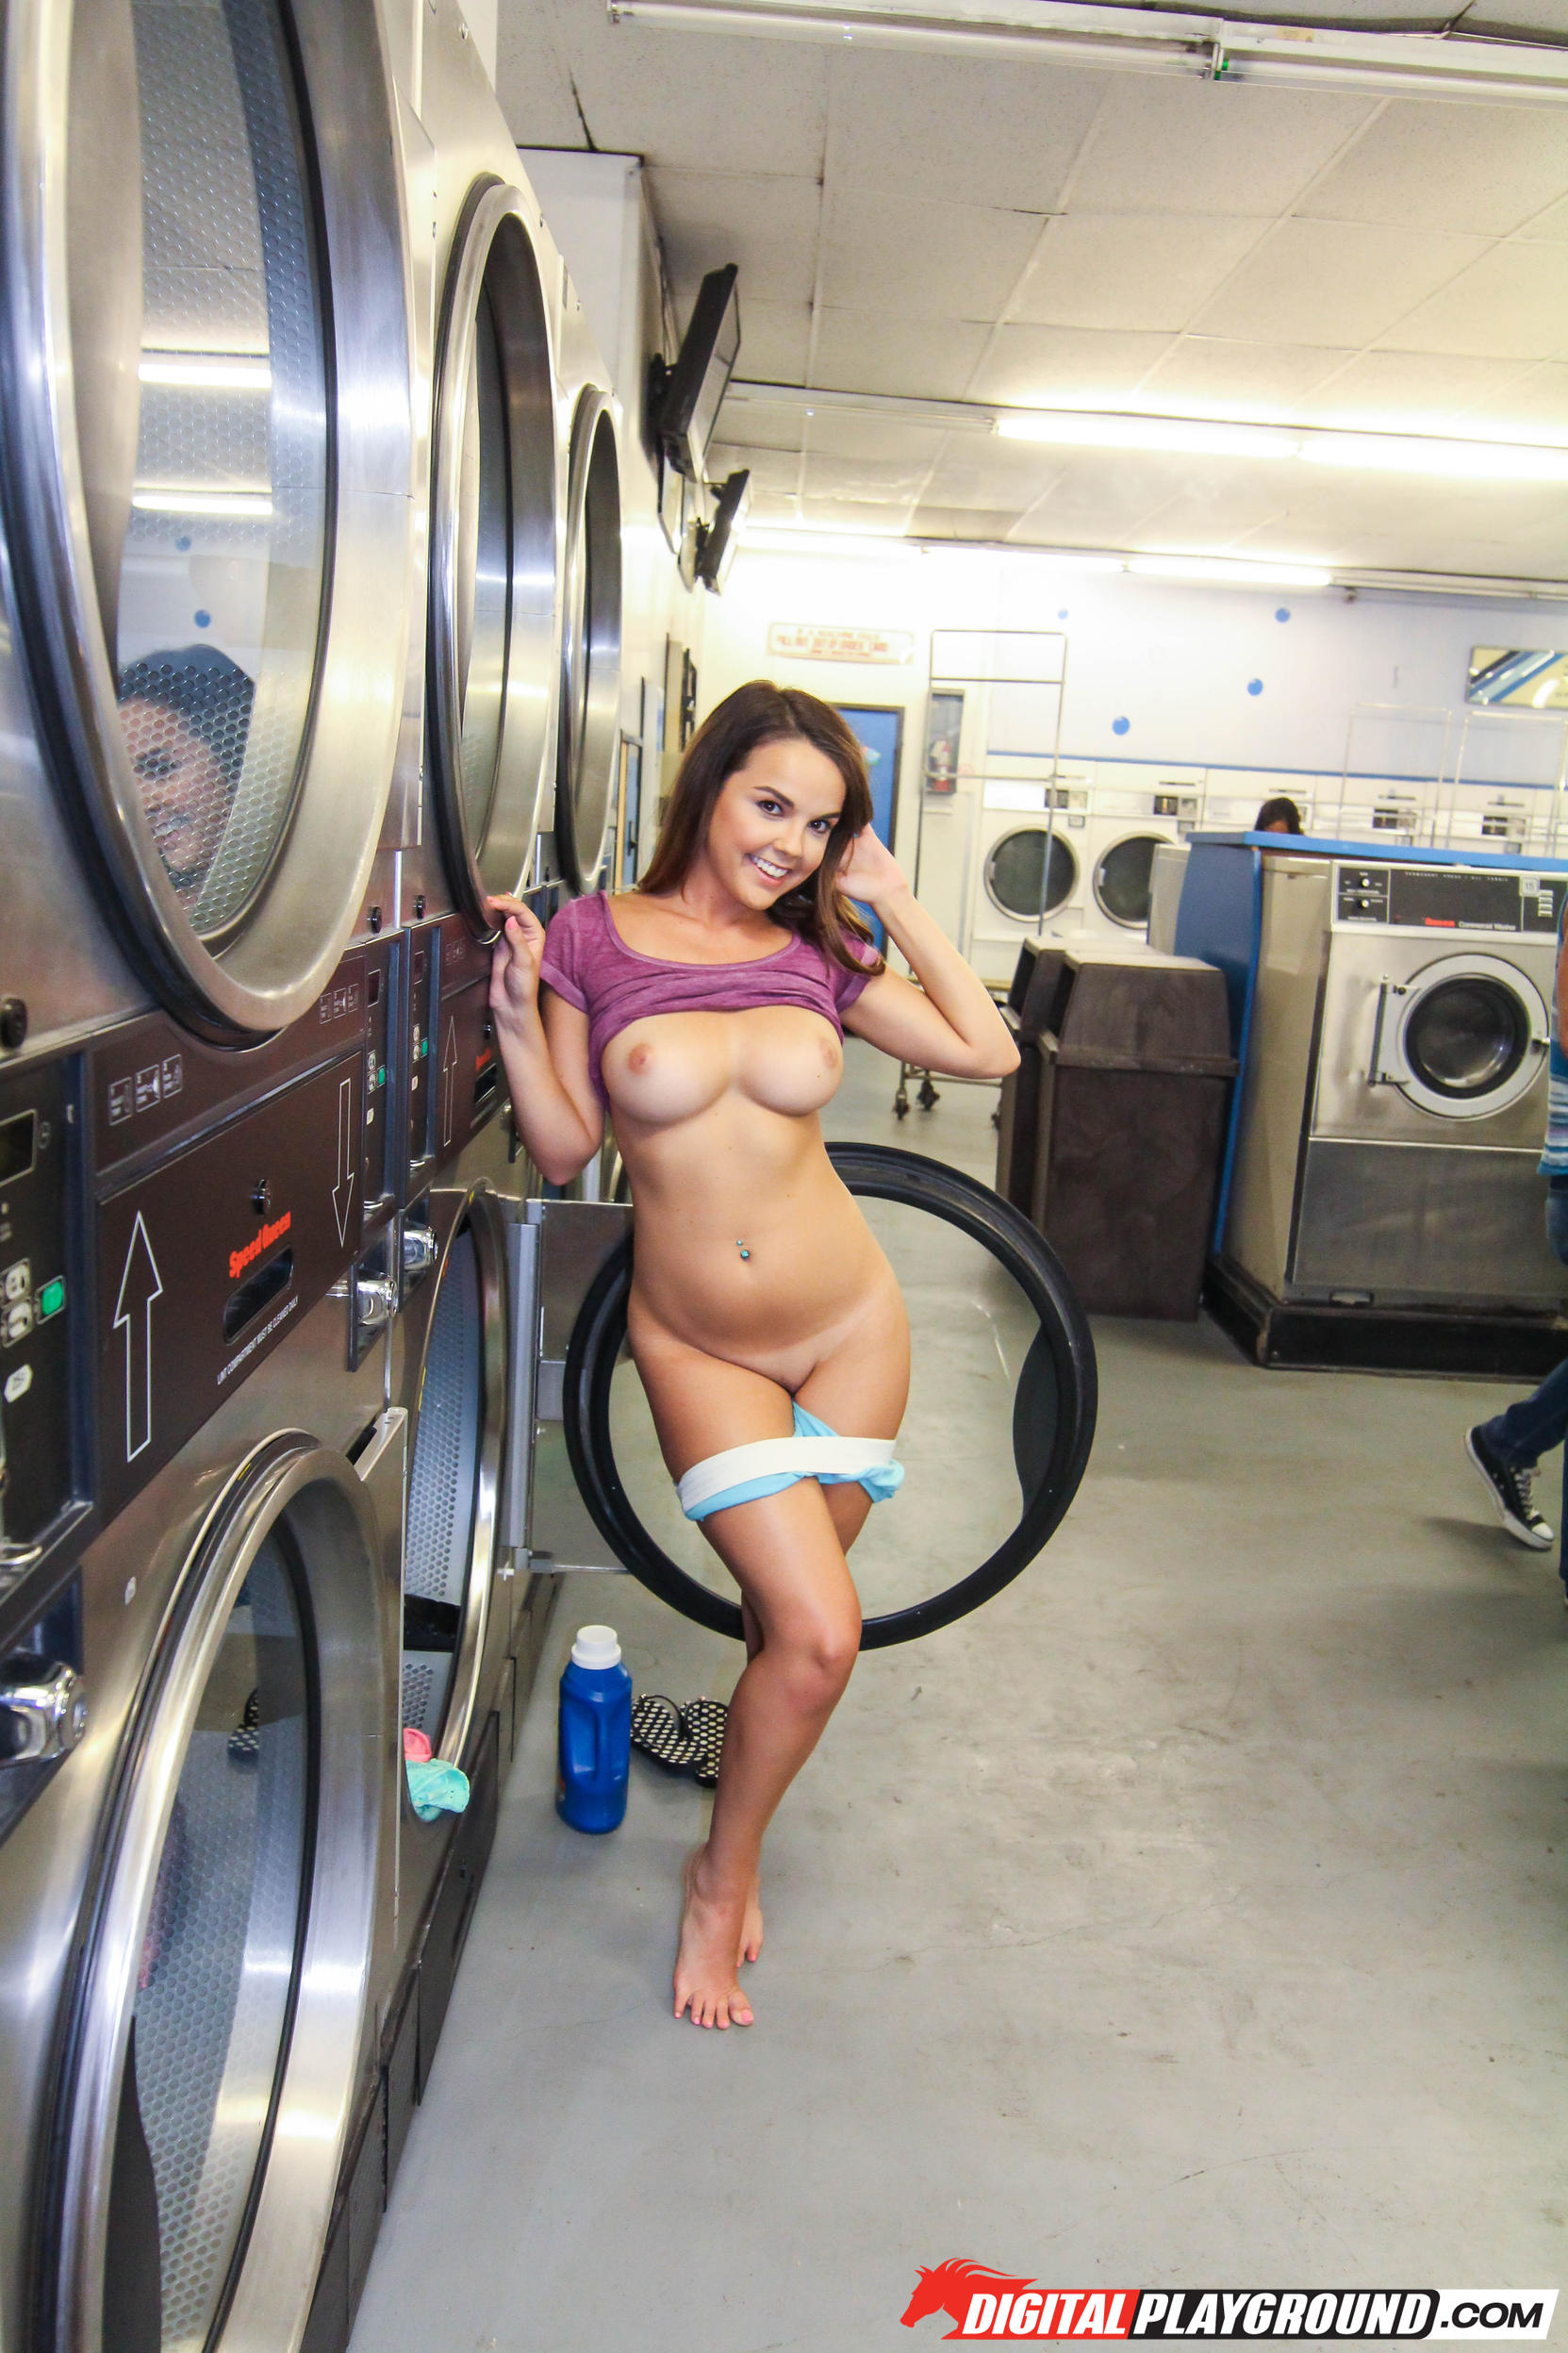 laundry-girls-nude-washing-machine-photo-mix-19